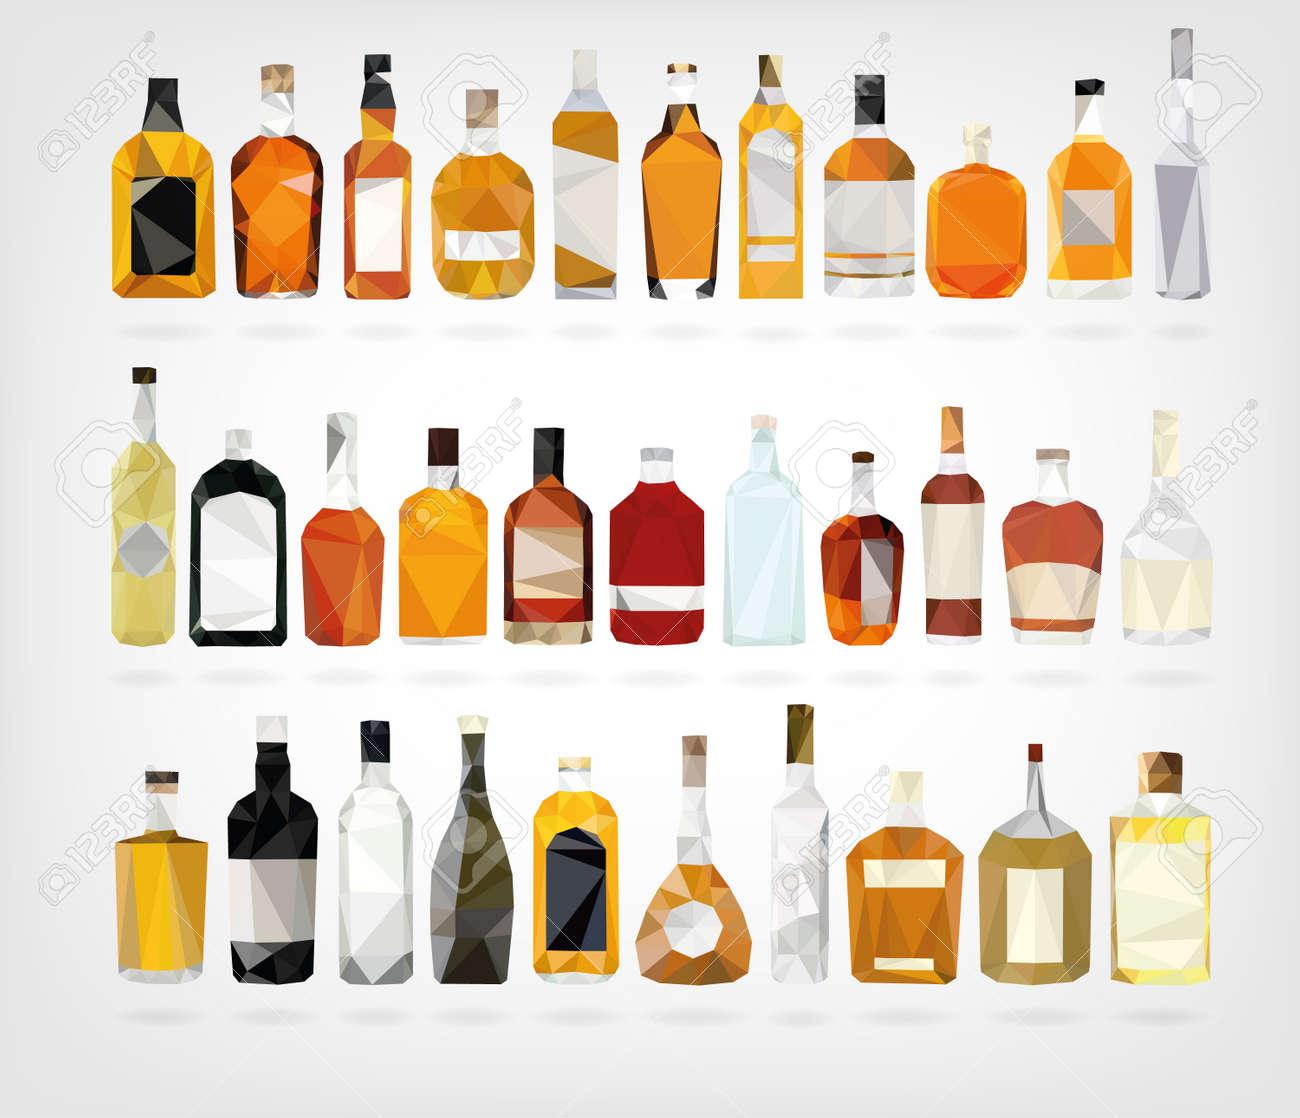 Low Poly Liquor Bottles - 38556036